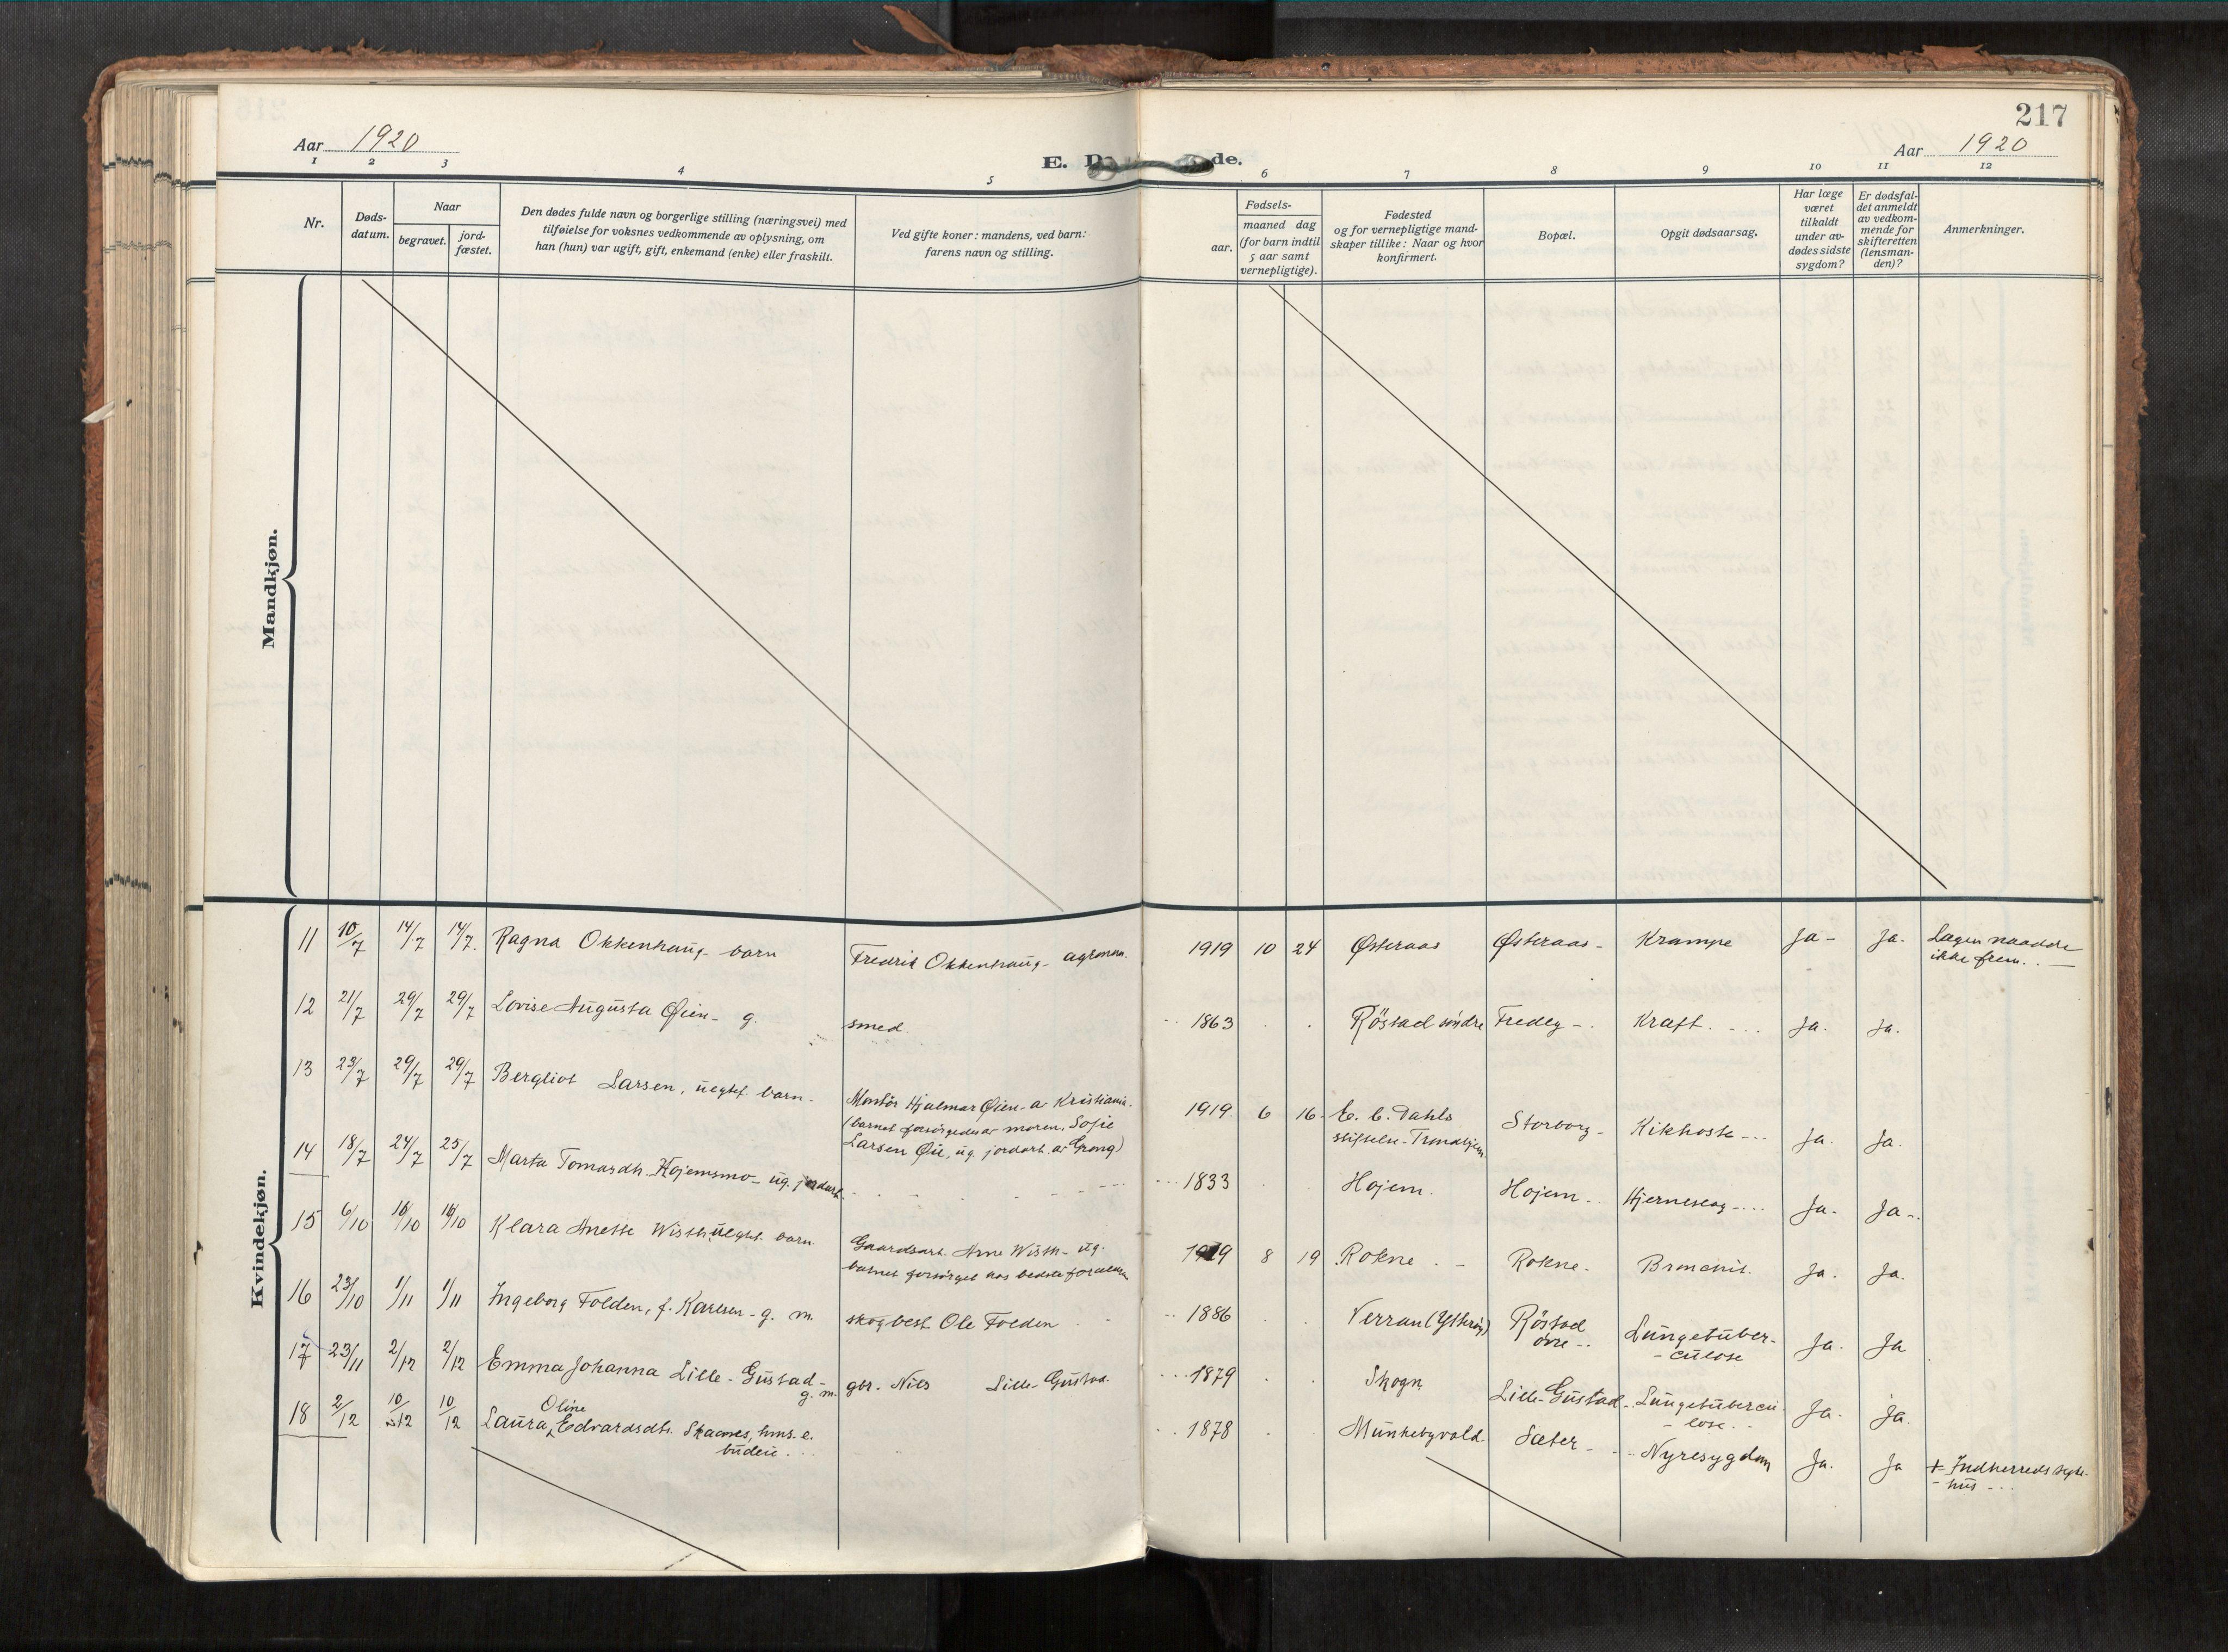 SAT, Levanger sokneprestkontor*, Parish register (official) no. 1, 1912-1935, p. 217